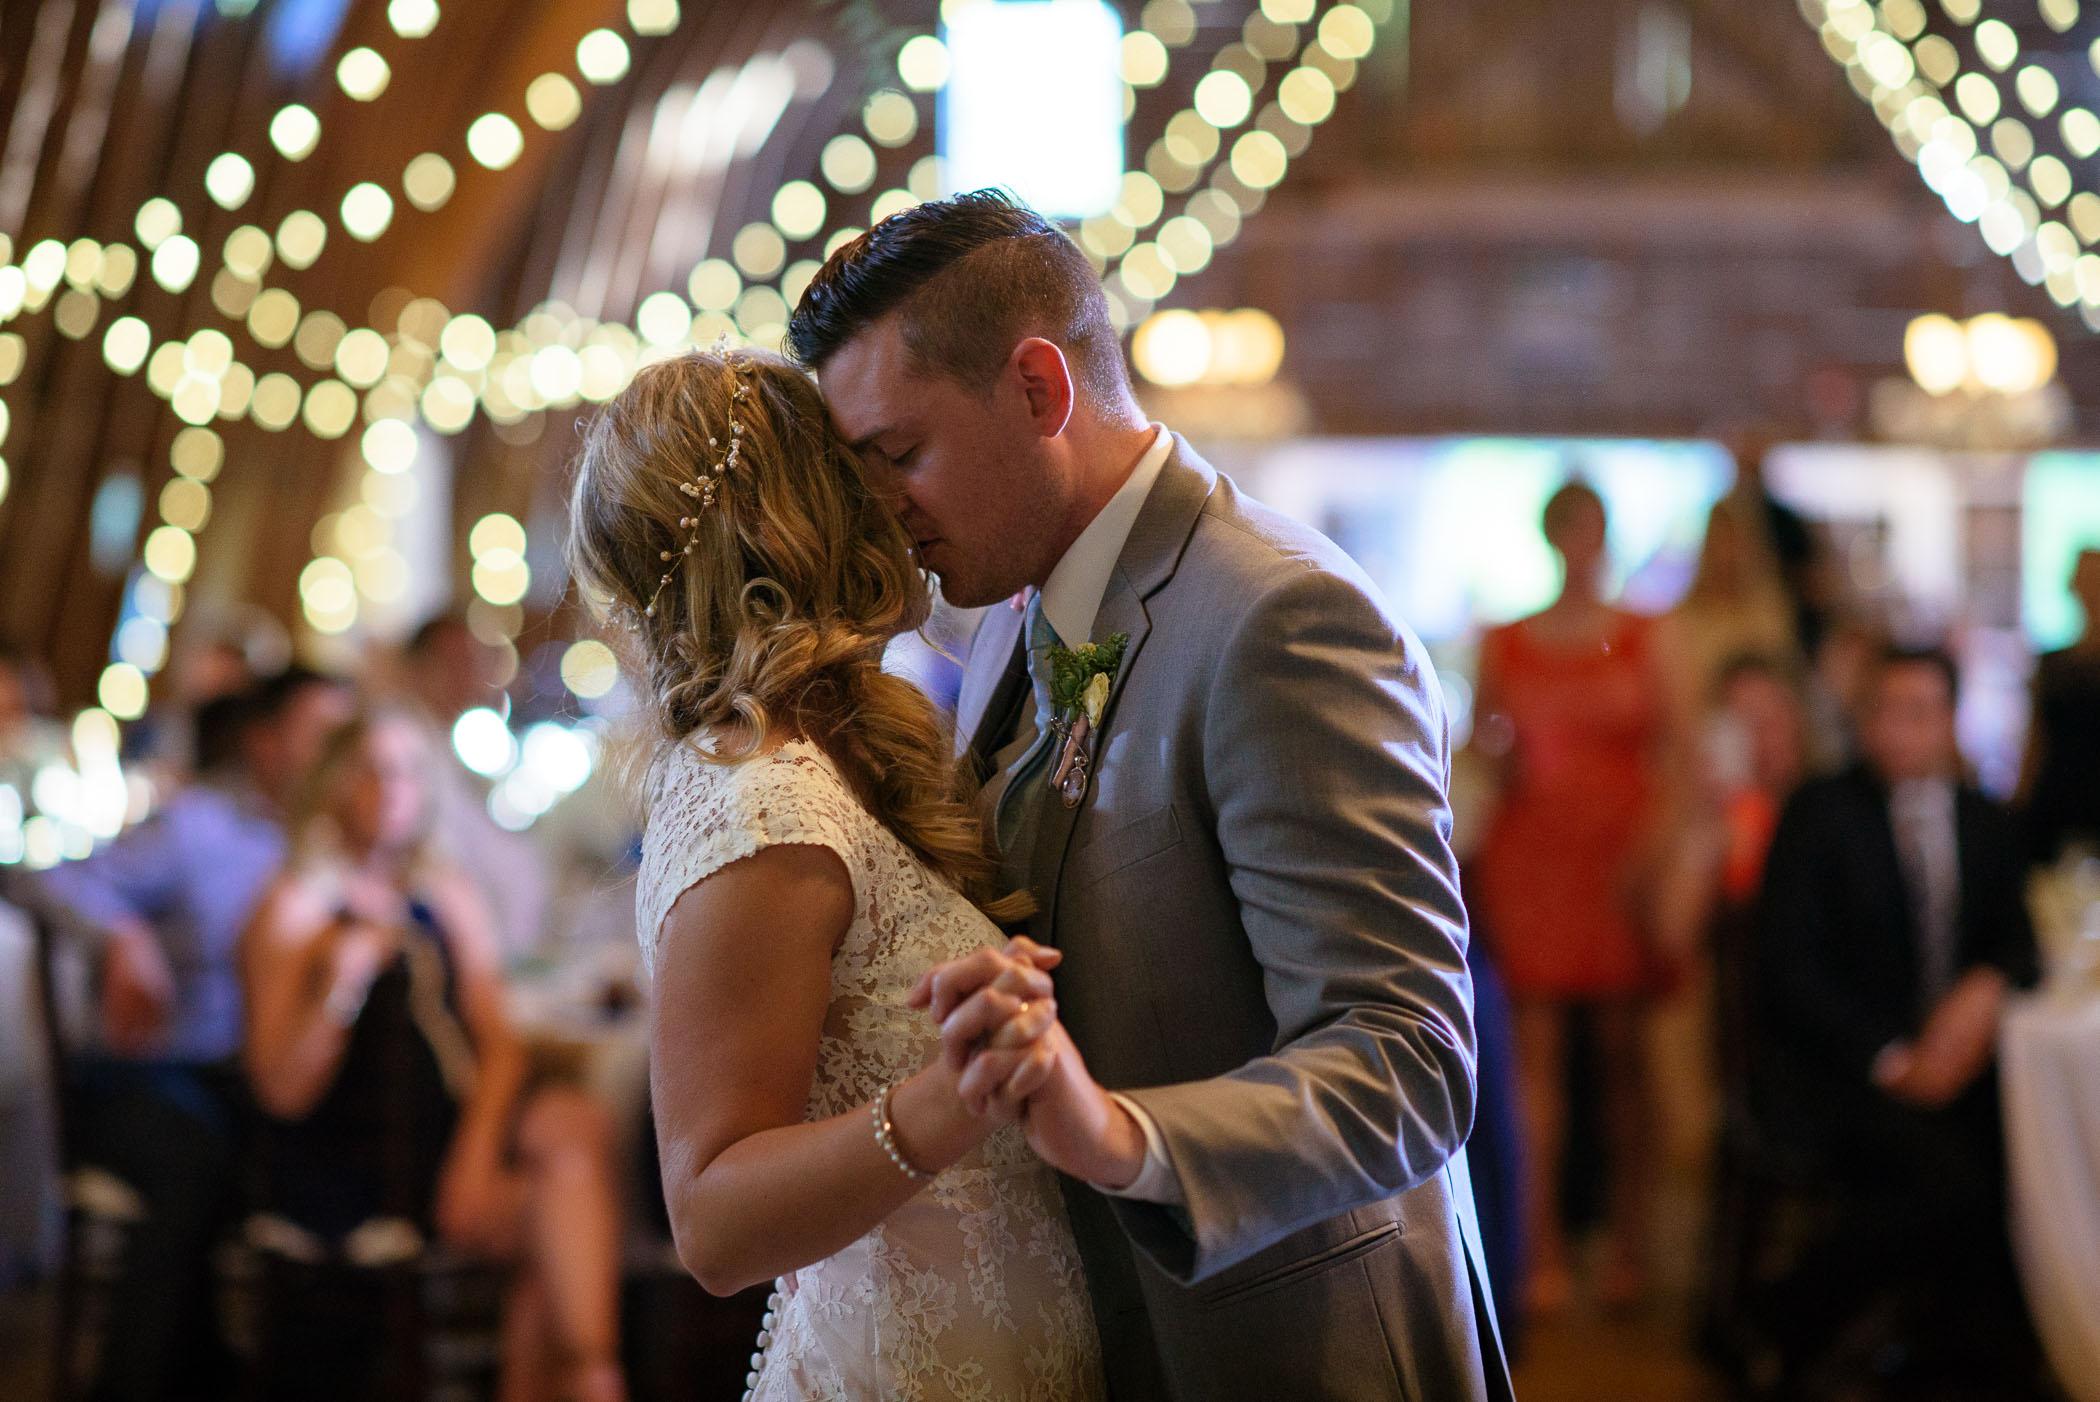 michigan_wedding_at_blue_dress_barn_057.jpg